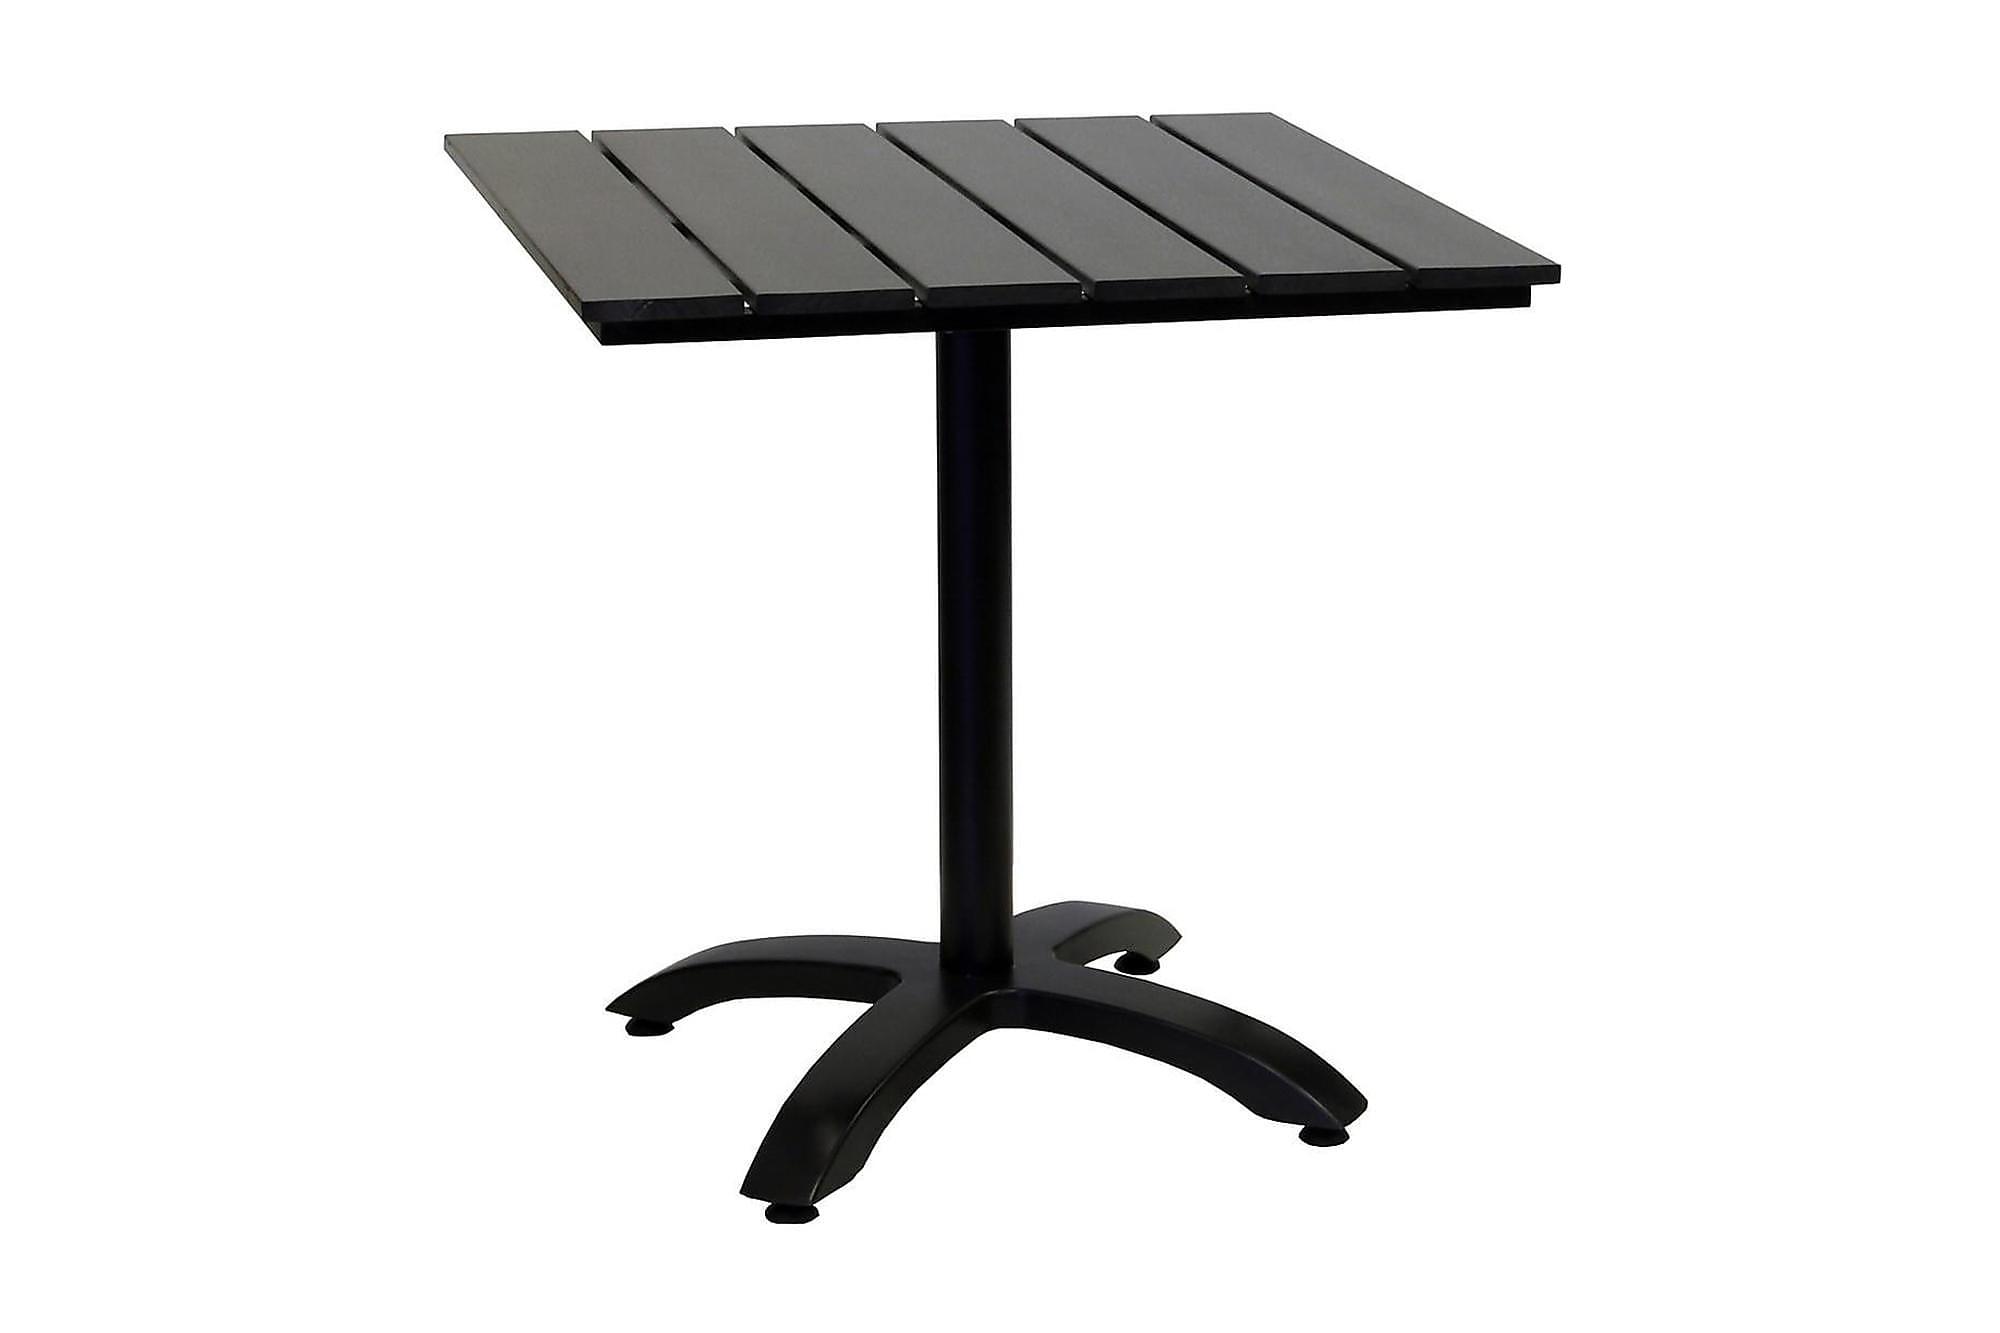 HILLERSTORP BRIGHTON Cafébord 70x70 Svart/Aluminium, Cafebord